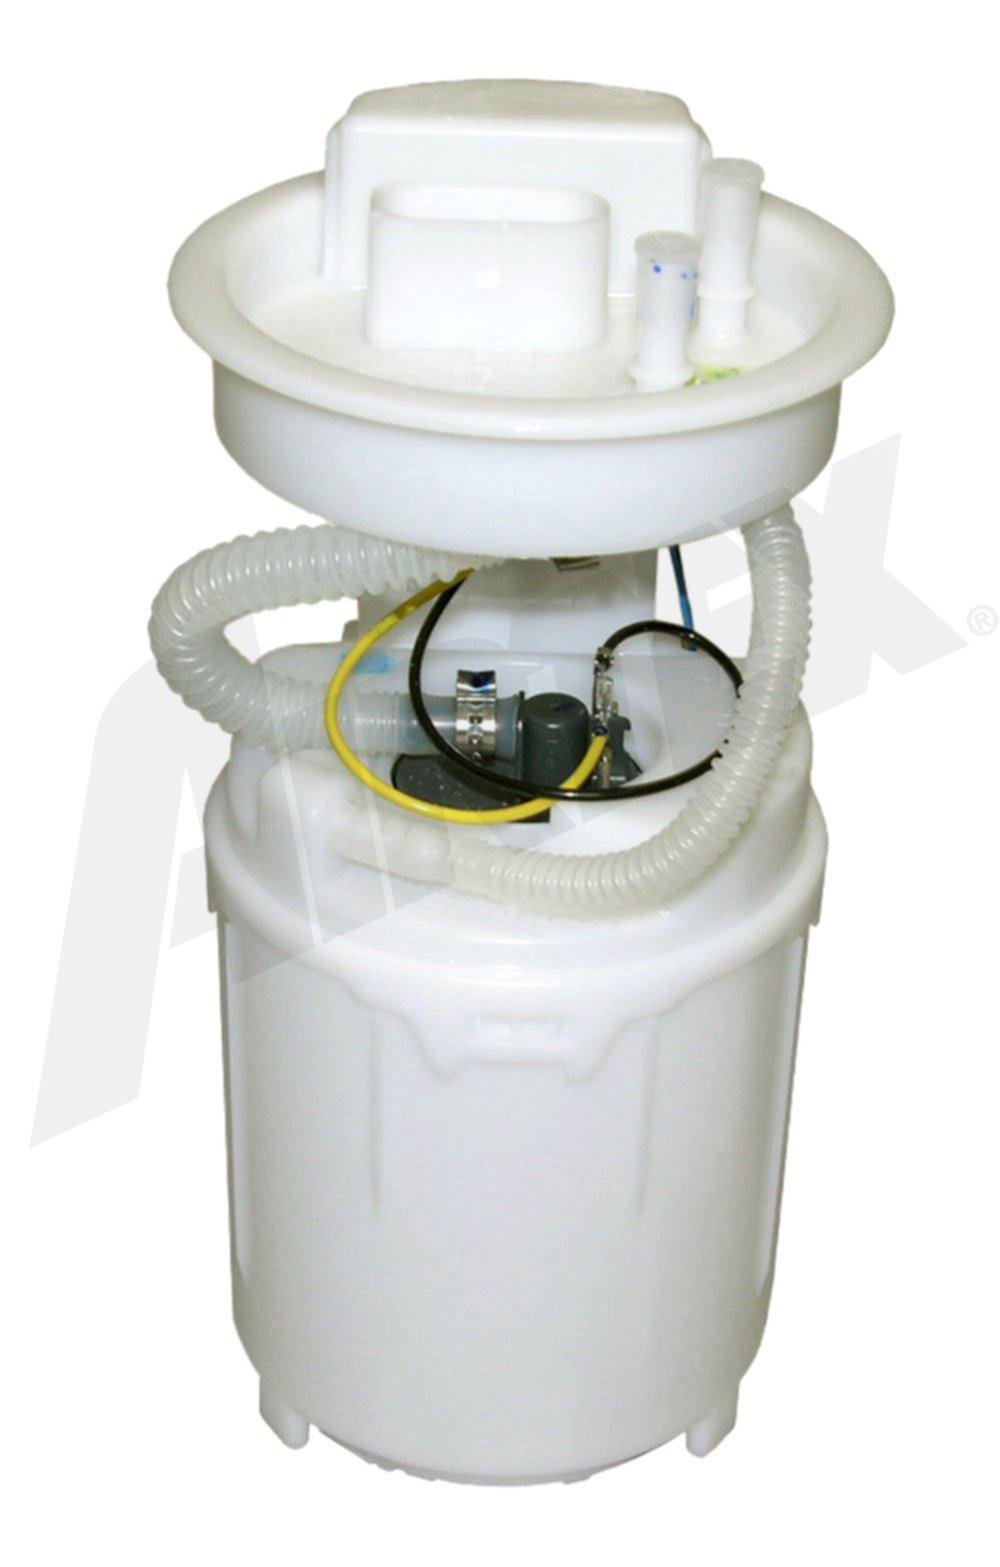 Airtex Fuel Pumps E8424M Fuel Pump Module Assembly Fits 1998-2010 Volkswagen Beetle